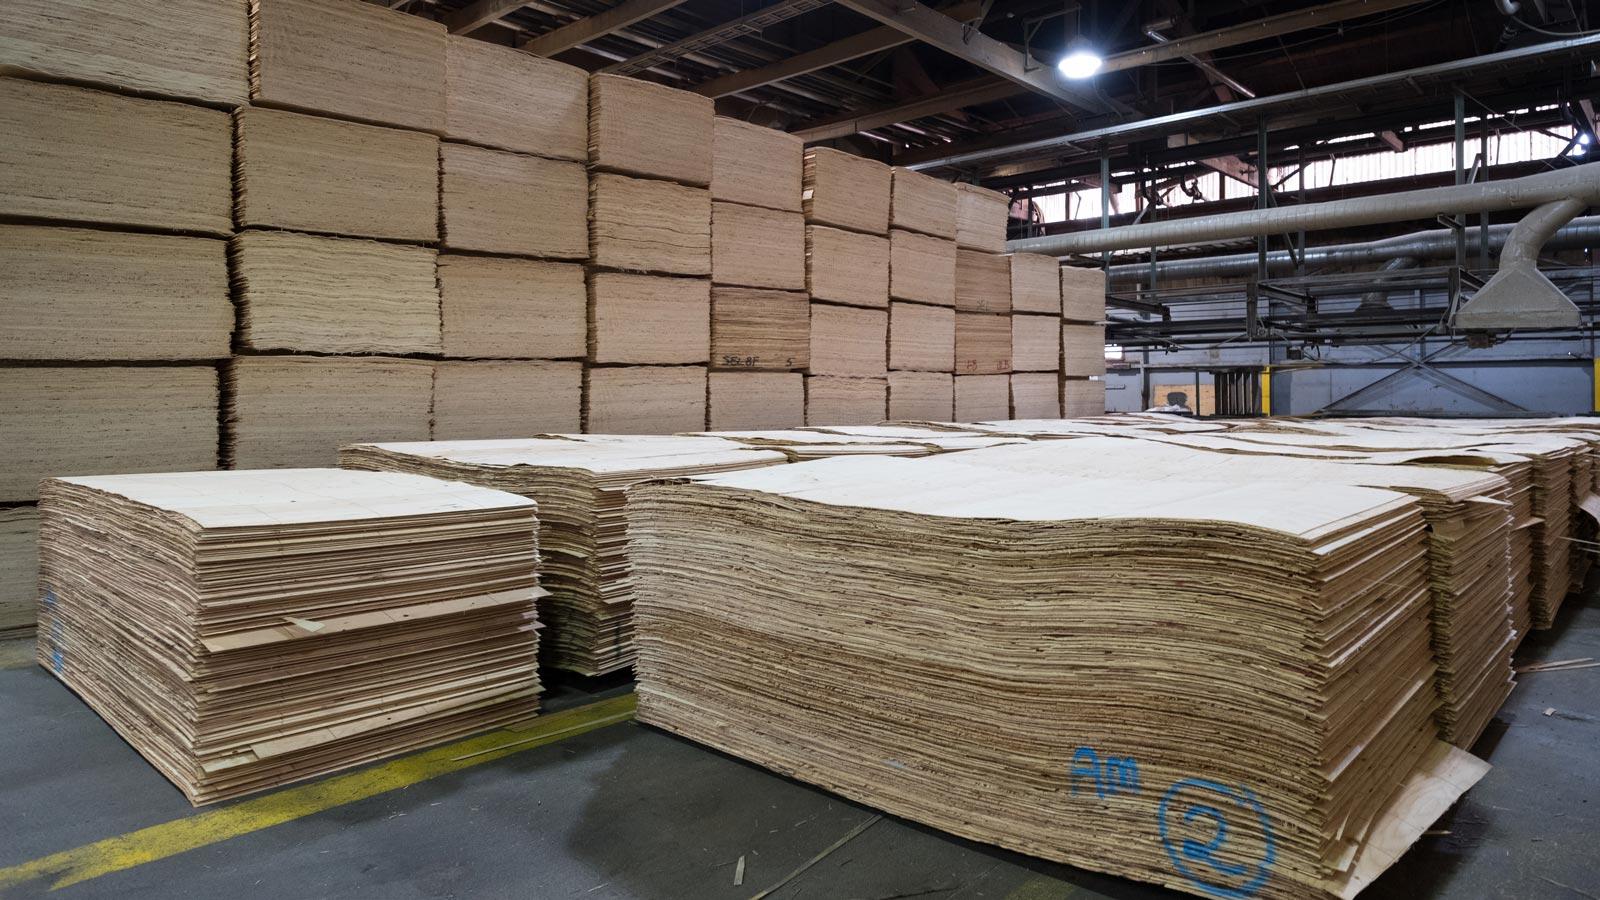 Tolko veneer product stacked at facility